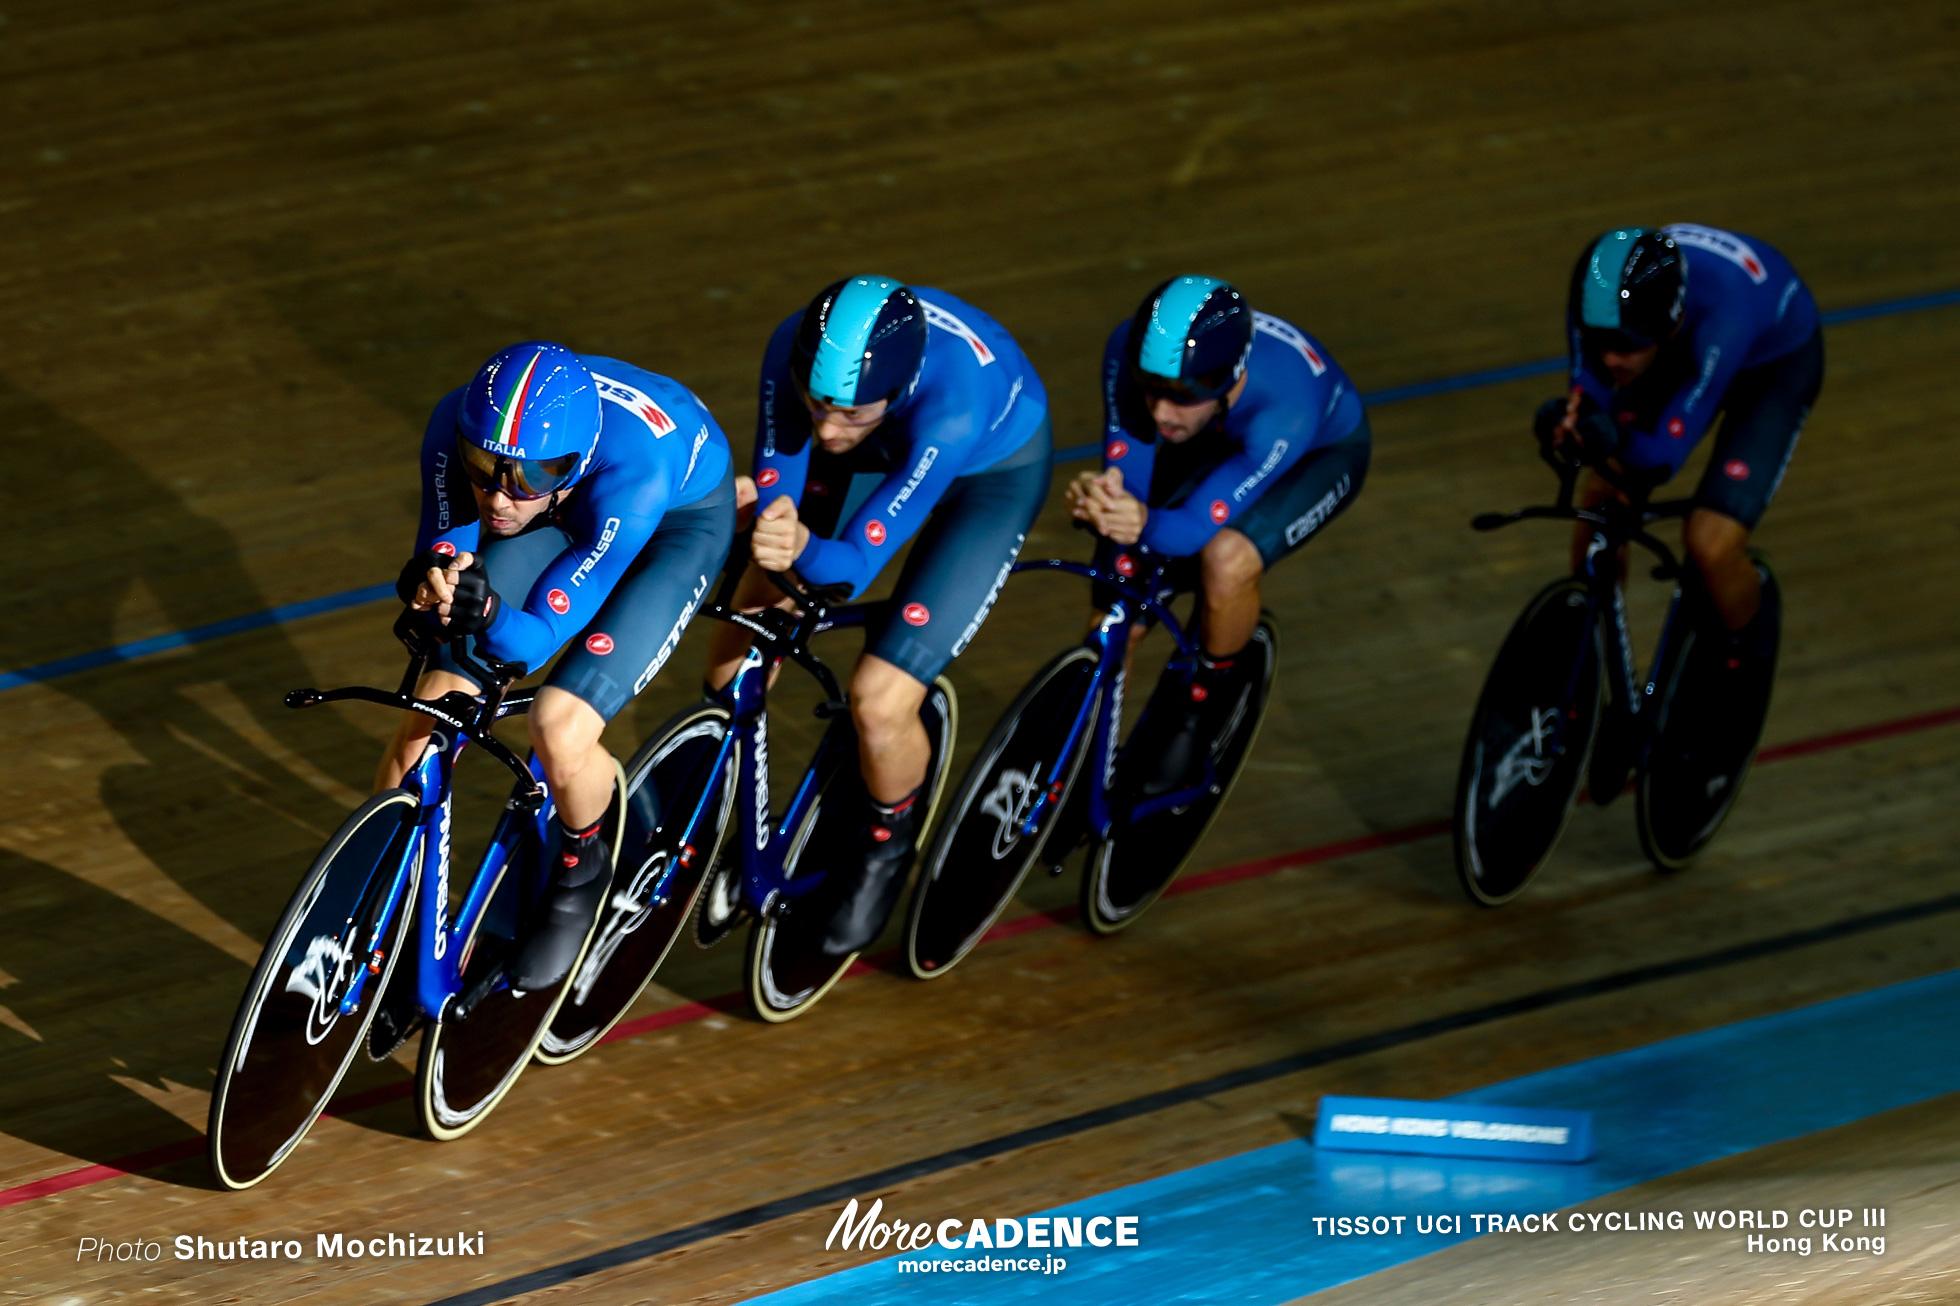 Final / Men's Team Pursuit / TISSOT UCI TRACK CYCLING WORLD CUP III, Hong Kong, Francesco LAMON フランチェスコ・ラモーン Carloalberto GIORDANI カルロベルト・ジョルダーニ Davide PLEBANI ダヴィデ・プレバーニ Michele SCARTEZZINI ミケーレ・スカレテッティーニ